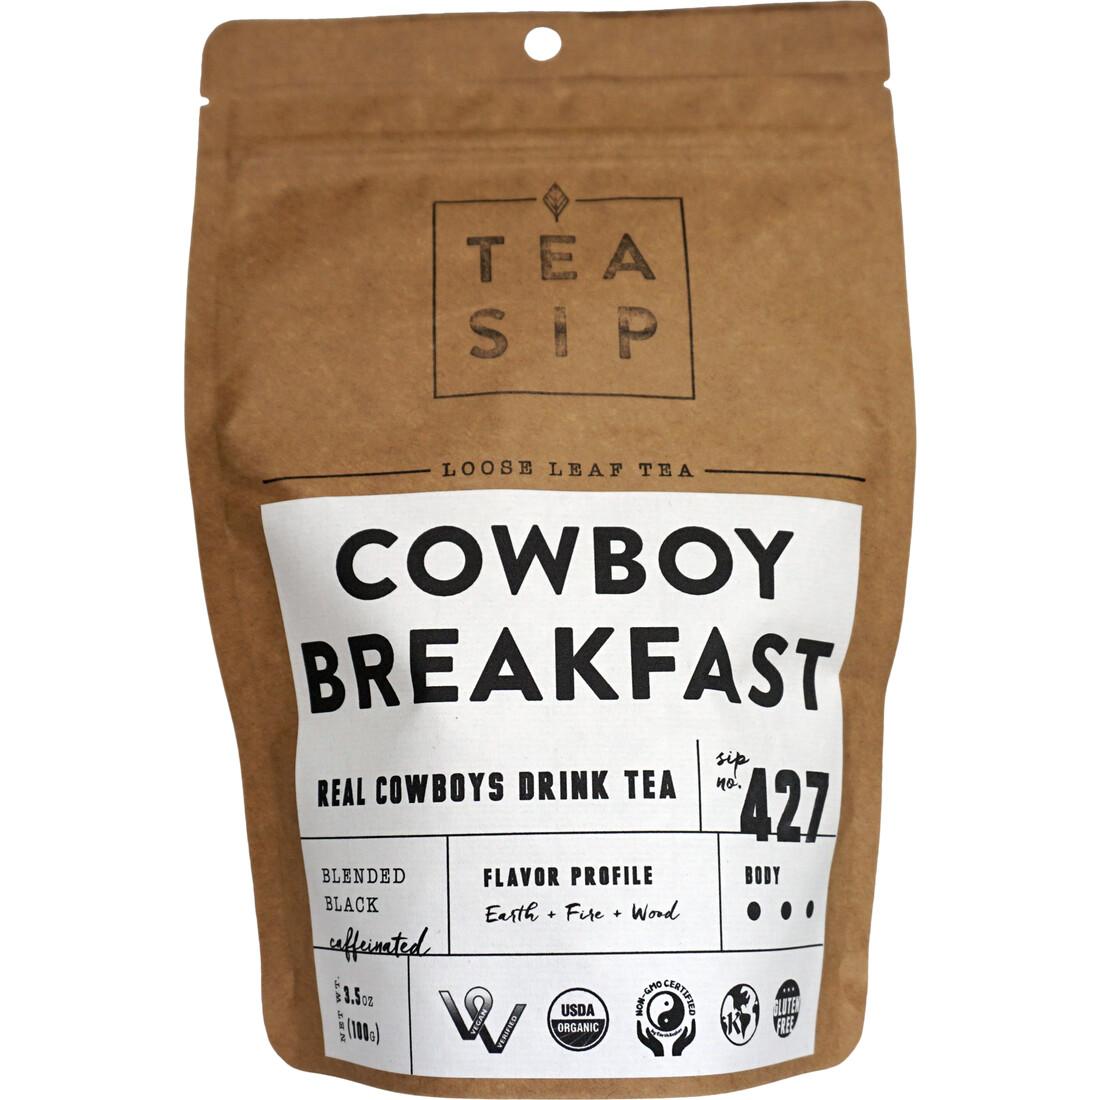 Cowboy Breakfast Tea 3.5 oz